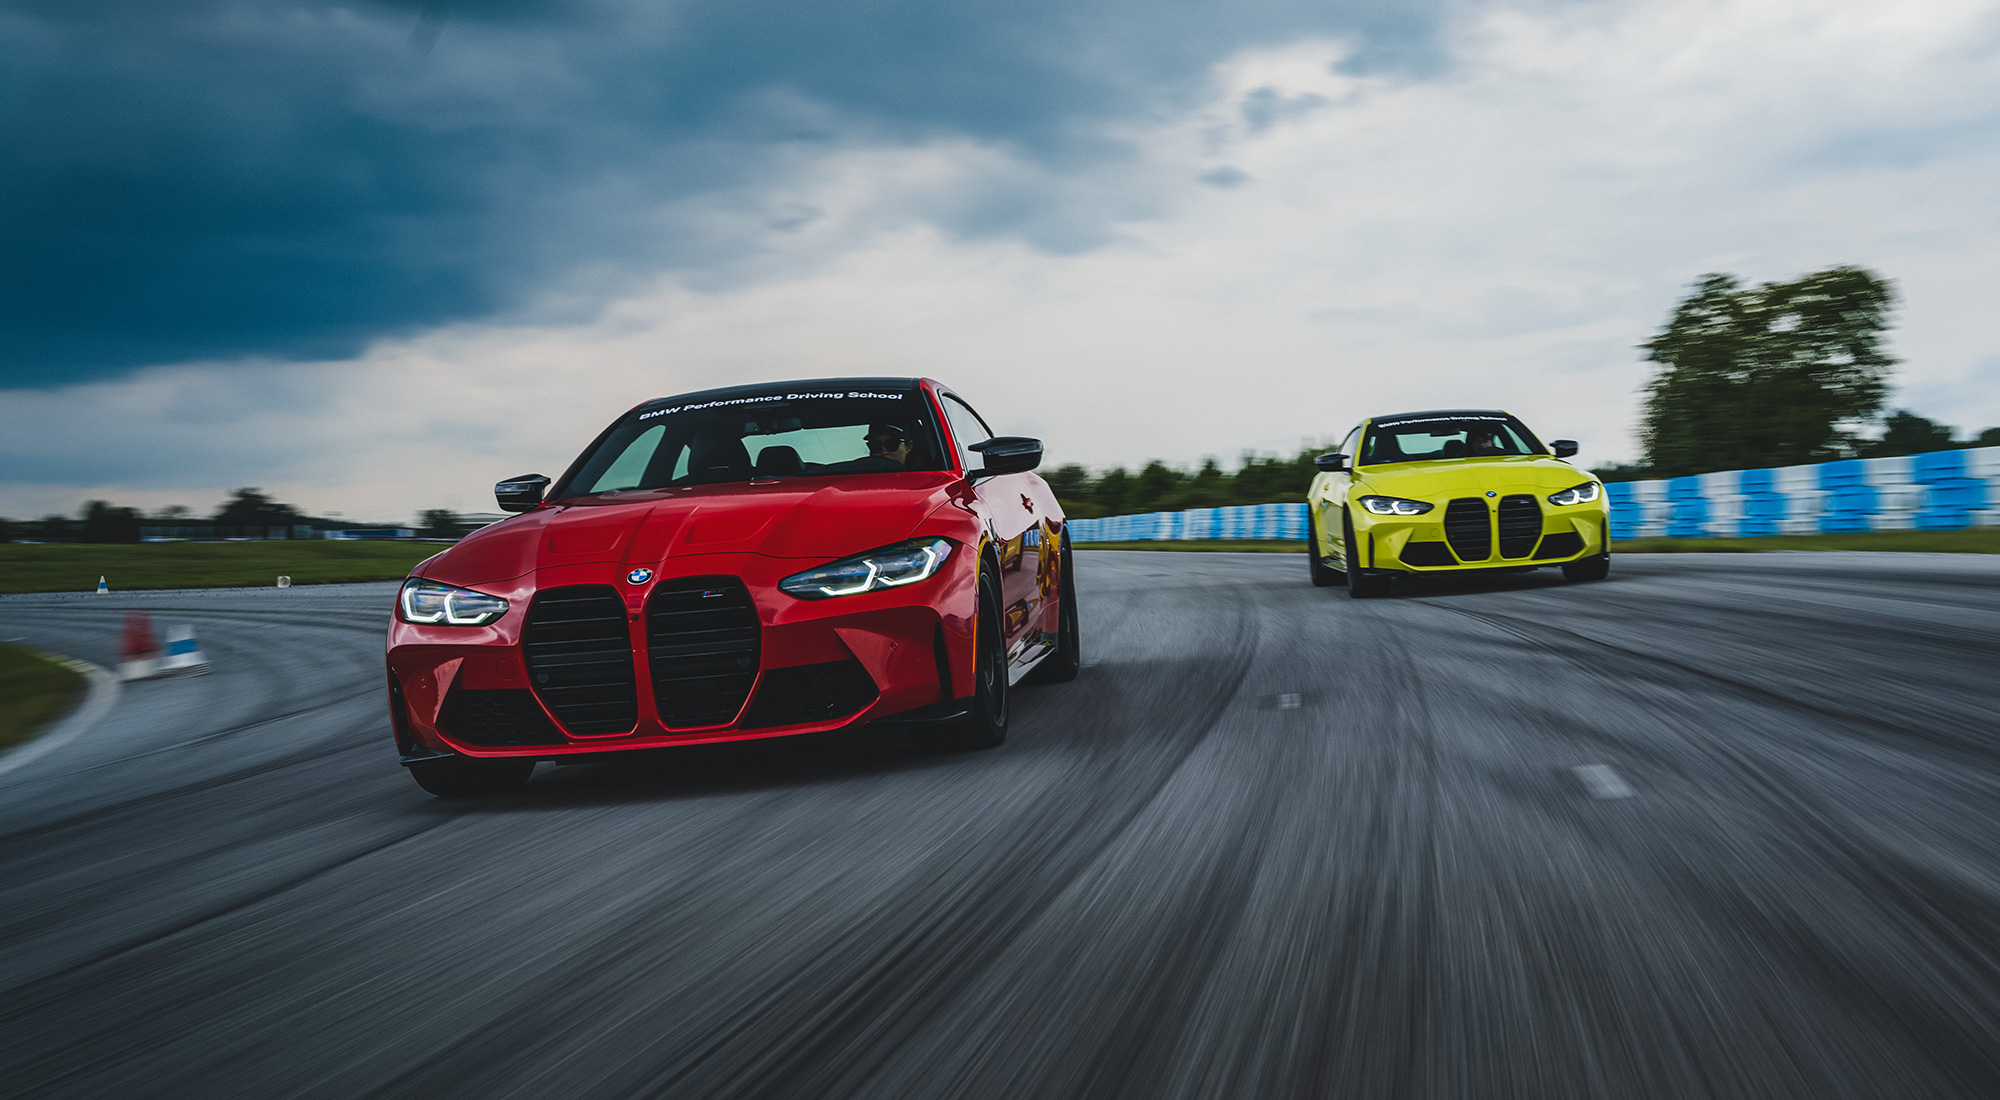 BMW M4 on track